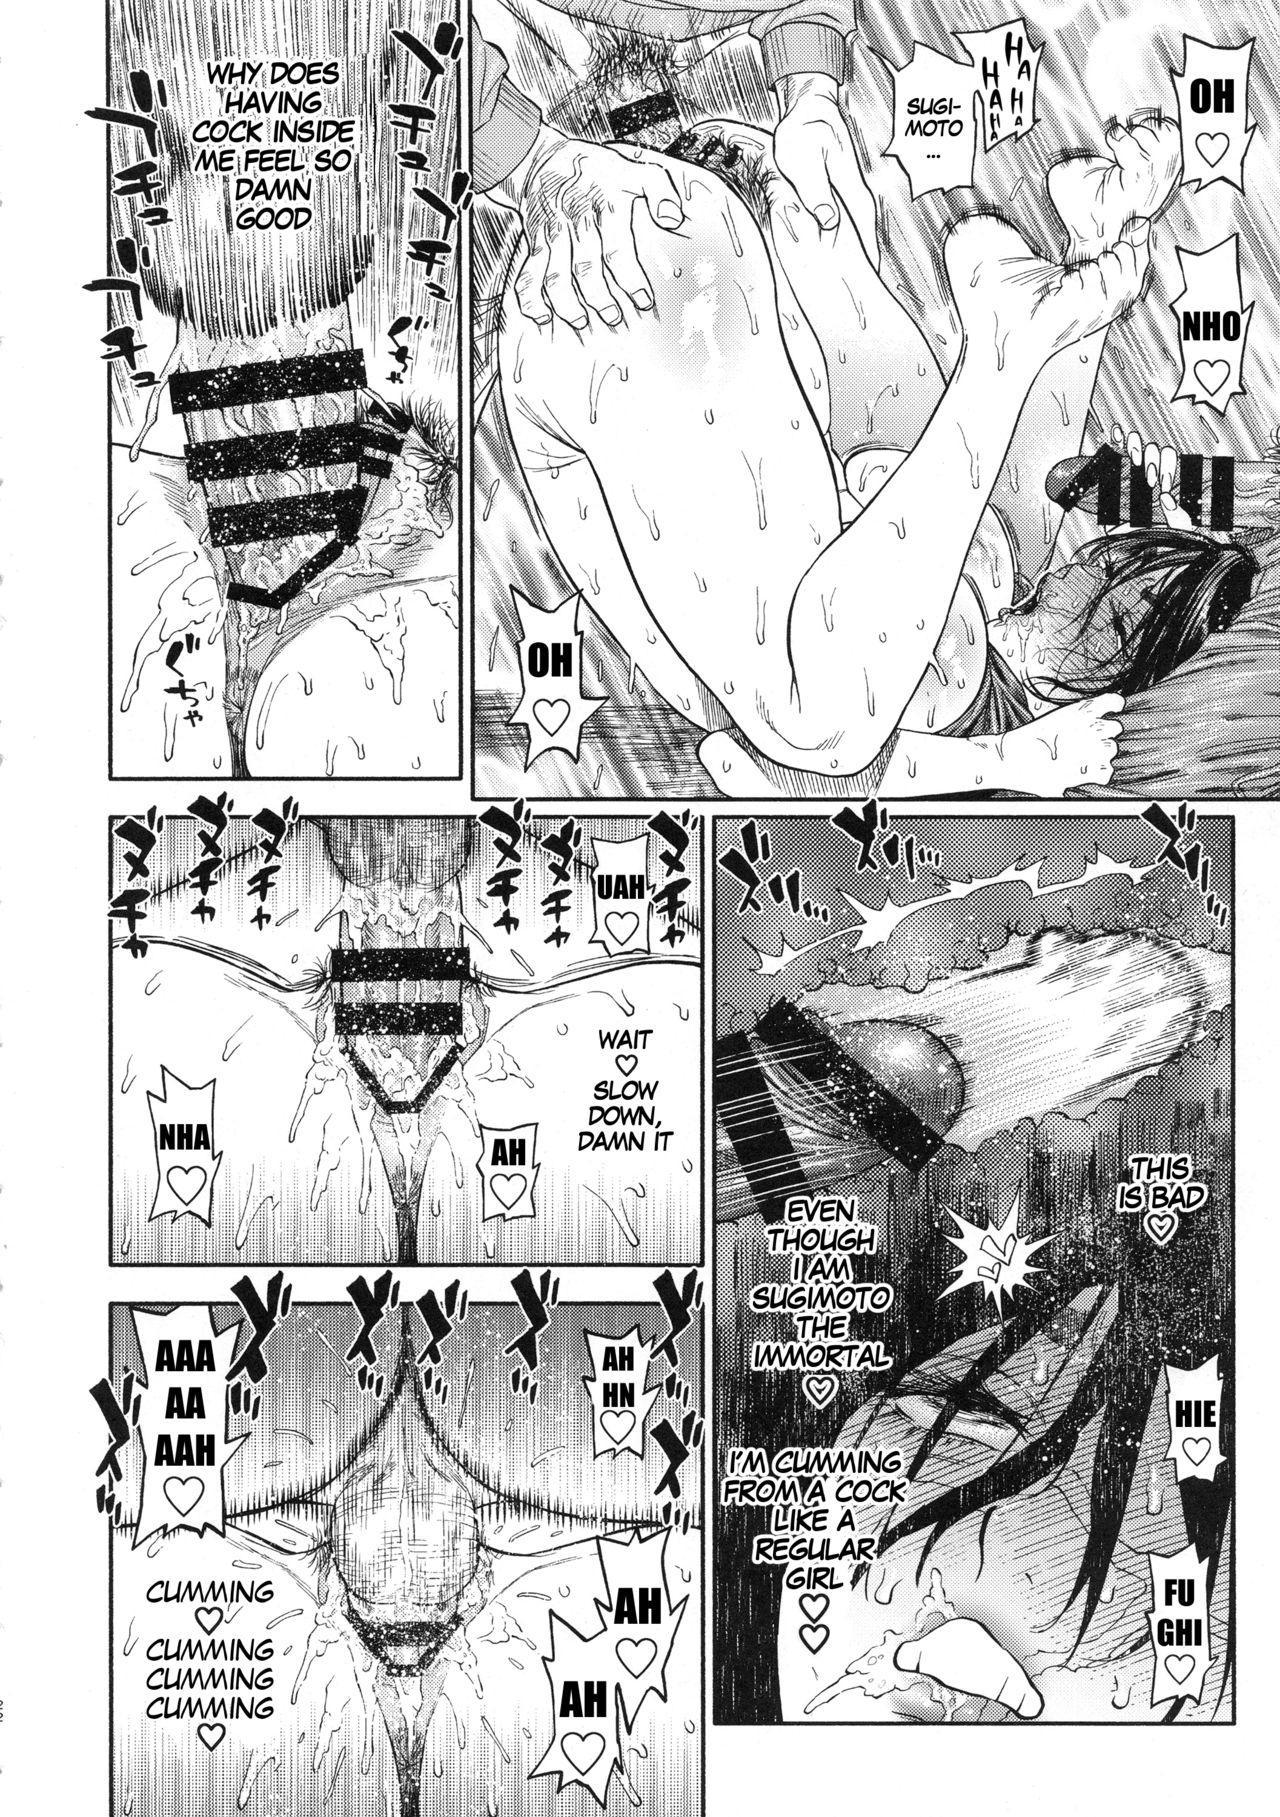 (SPARK13) [JAPAN (USA)] Sugimoto-san to Rakko Nabe Shiyou.   Let's Have Some Sea Otter Meat With Sugimoto-san (Golden Kamuy) [English] [MegaFagget] 20